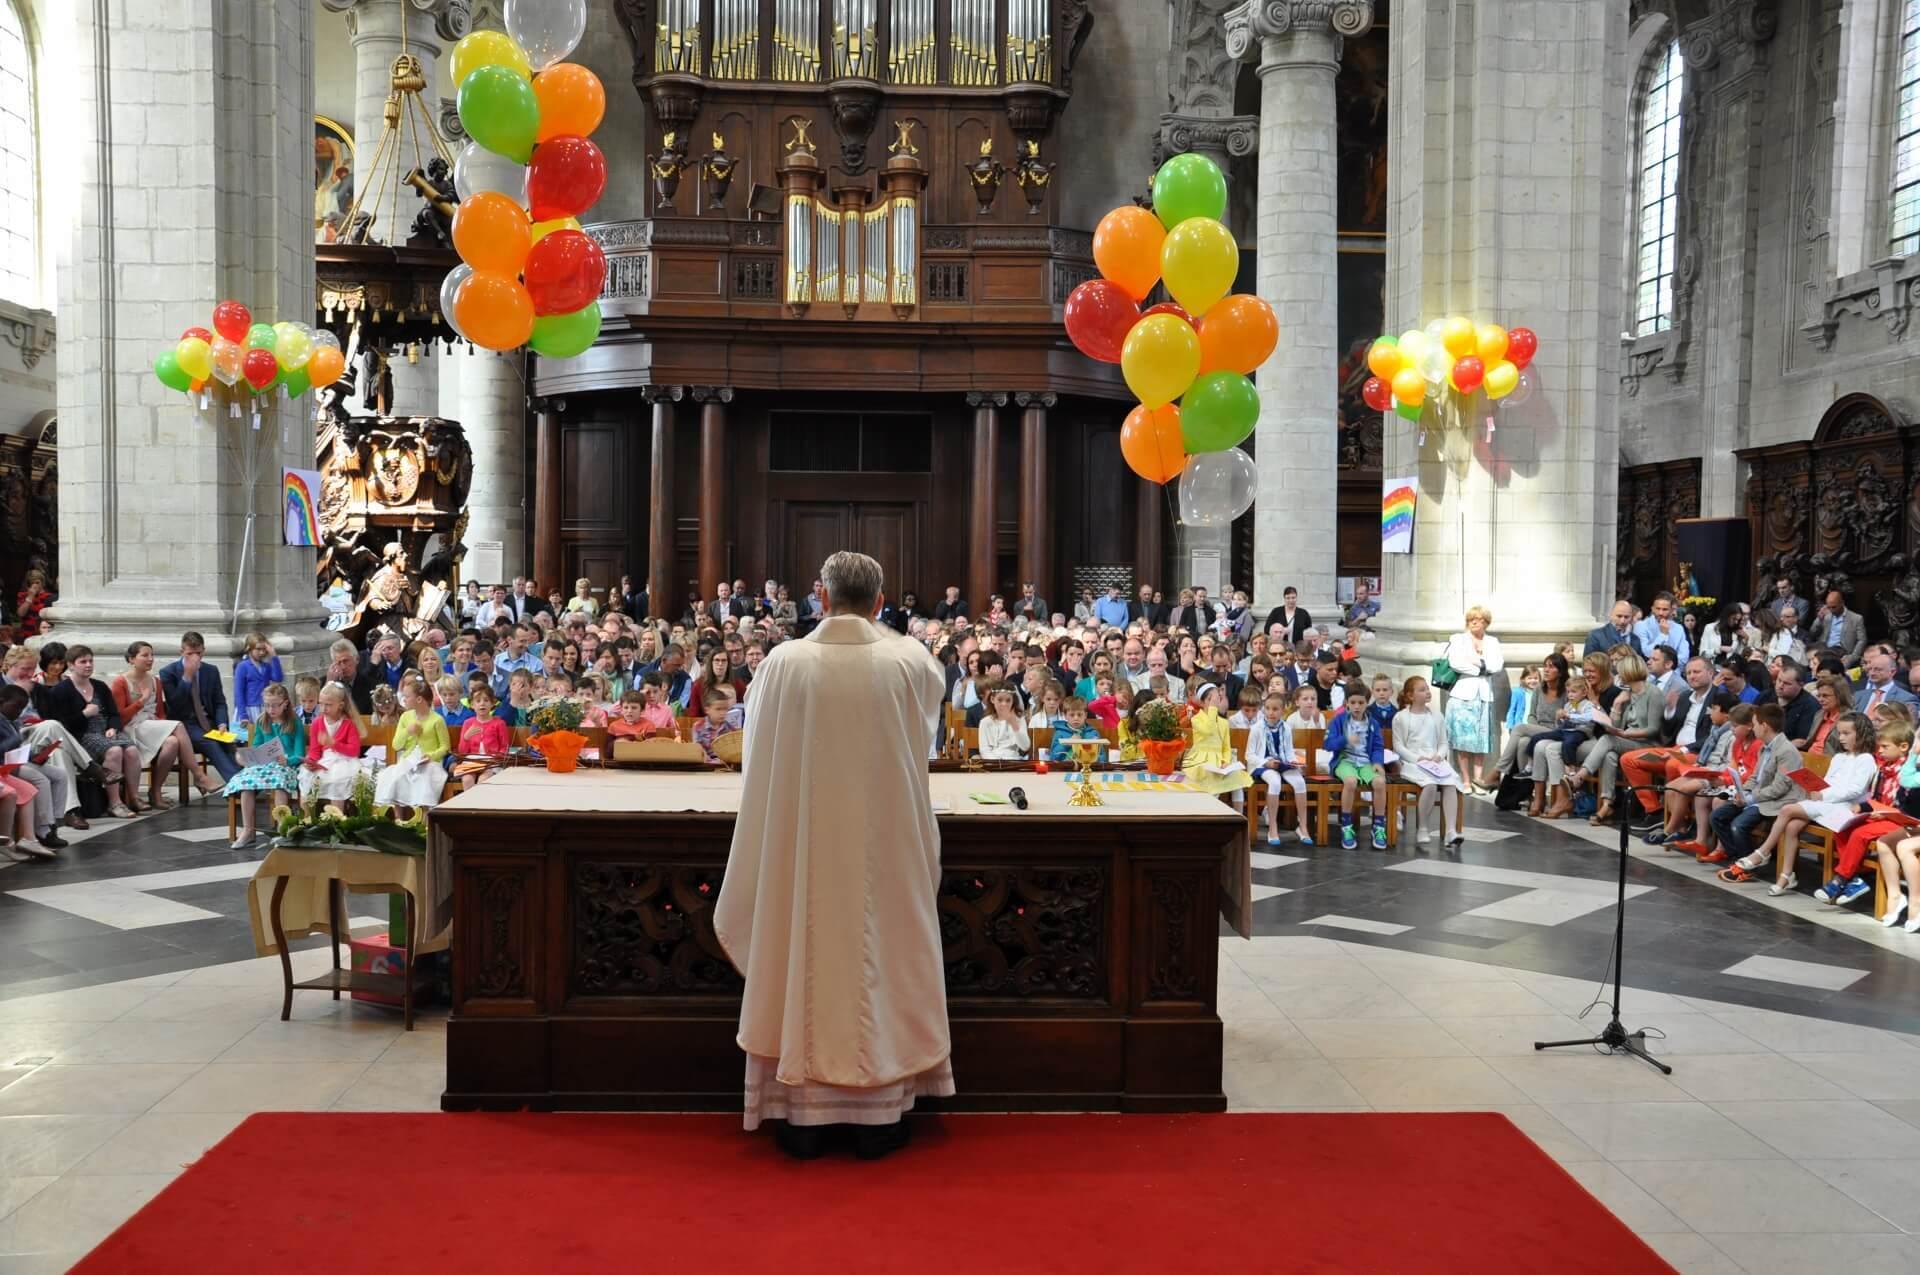 Virtuele ontsluiting van vieringen vanuit St.-Servaasbasiliek Grimbergen